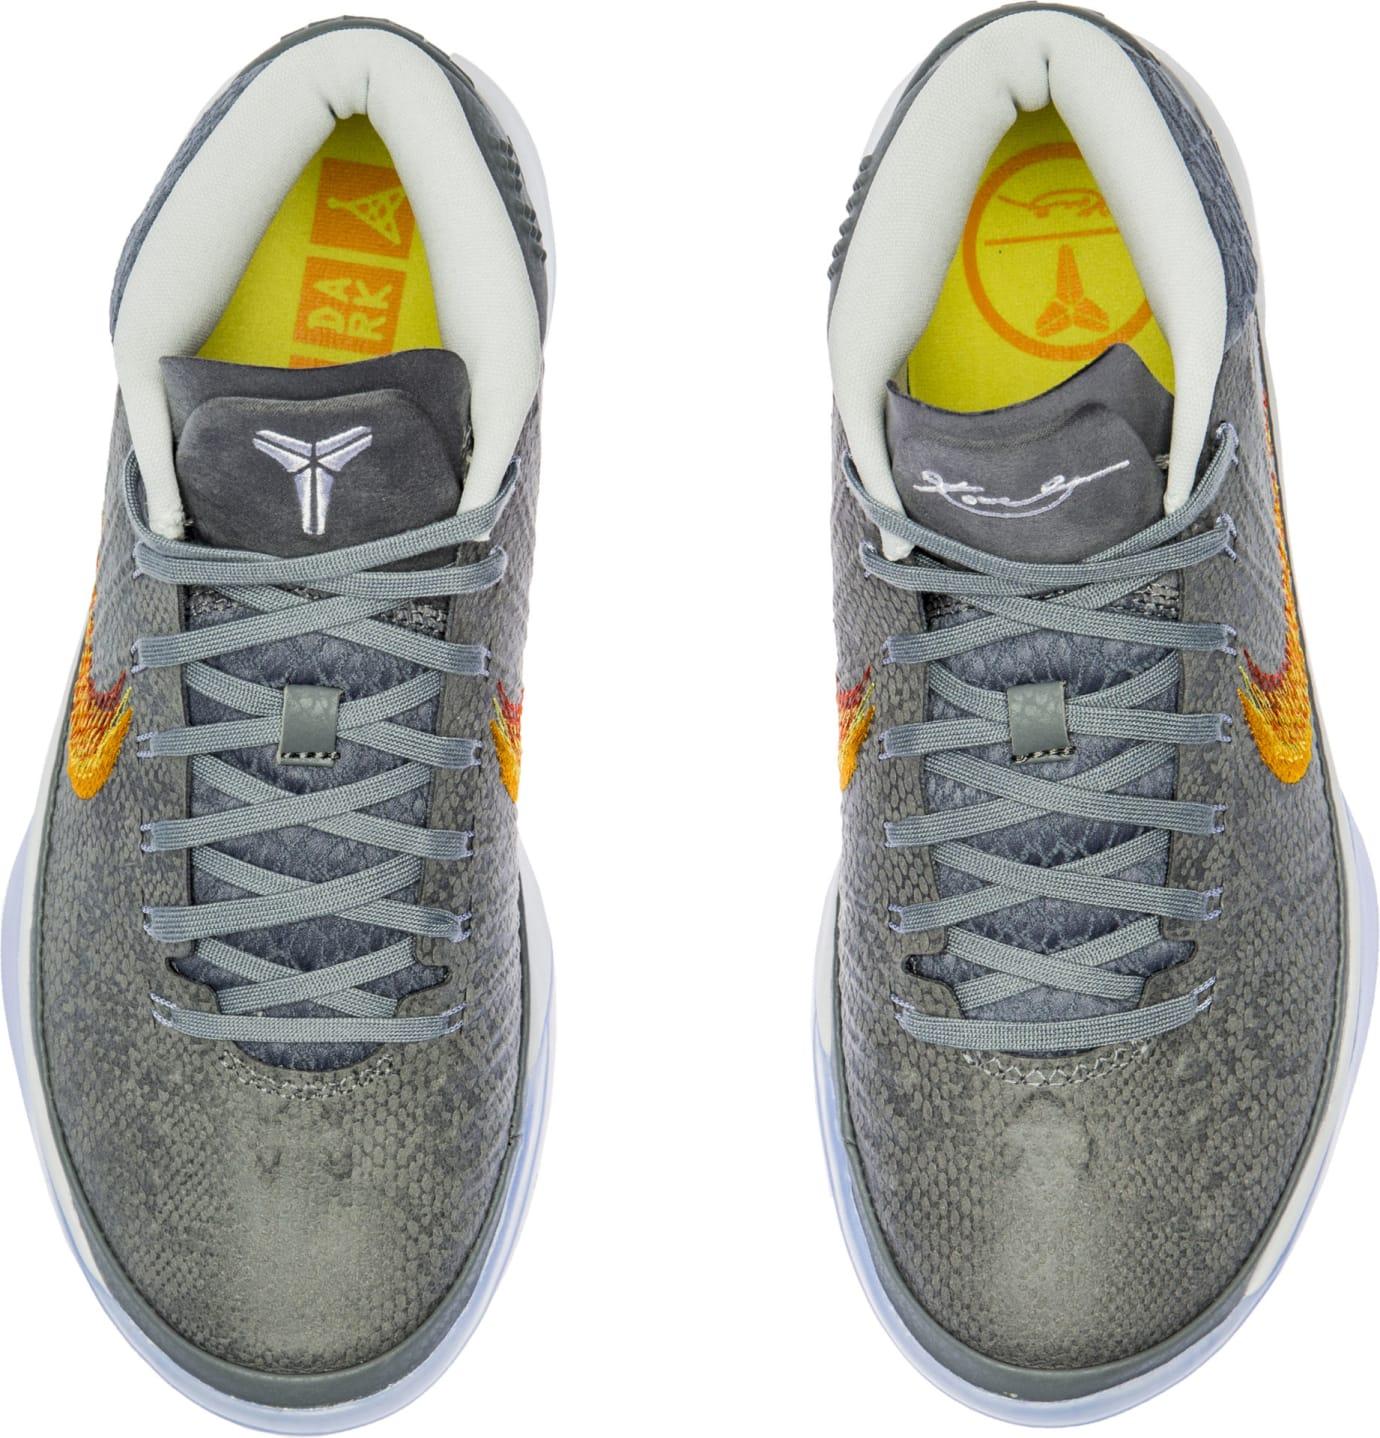 reputable site 7f157 4e203 Nike Kobe A.D. Mid Chrome Release Date 922482-005 Top